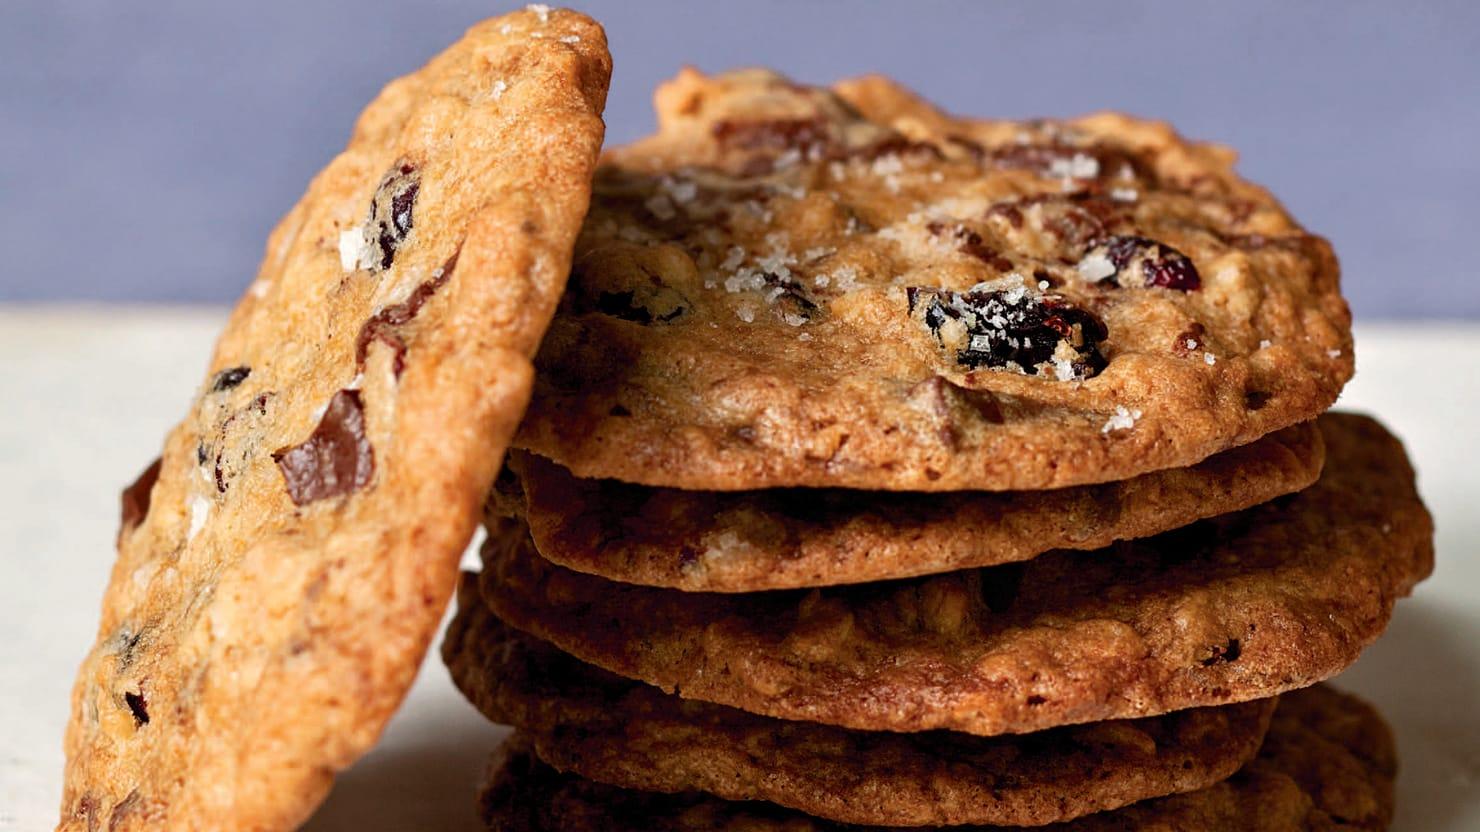 Make These Barefoot Contessa Salty Oatmeal Chocolate Chunk Cookies